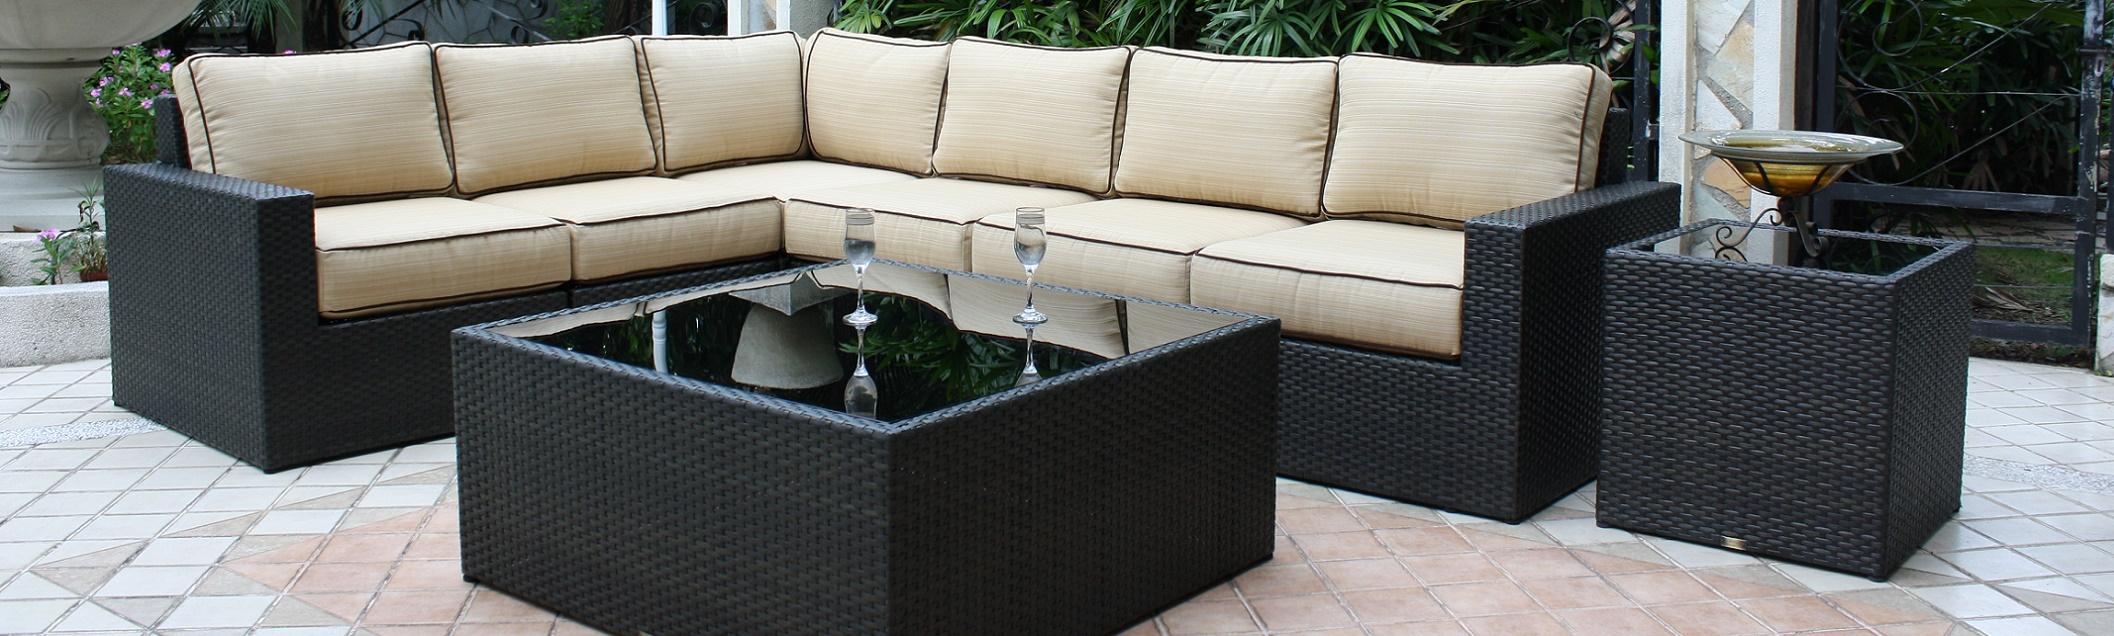 Northern Virginia Patio Renaissance Outdoor Furniture Washington Dc